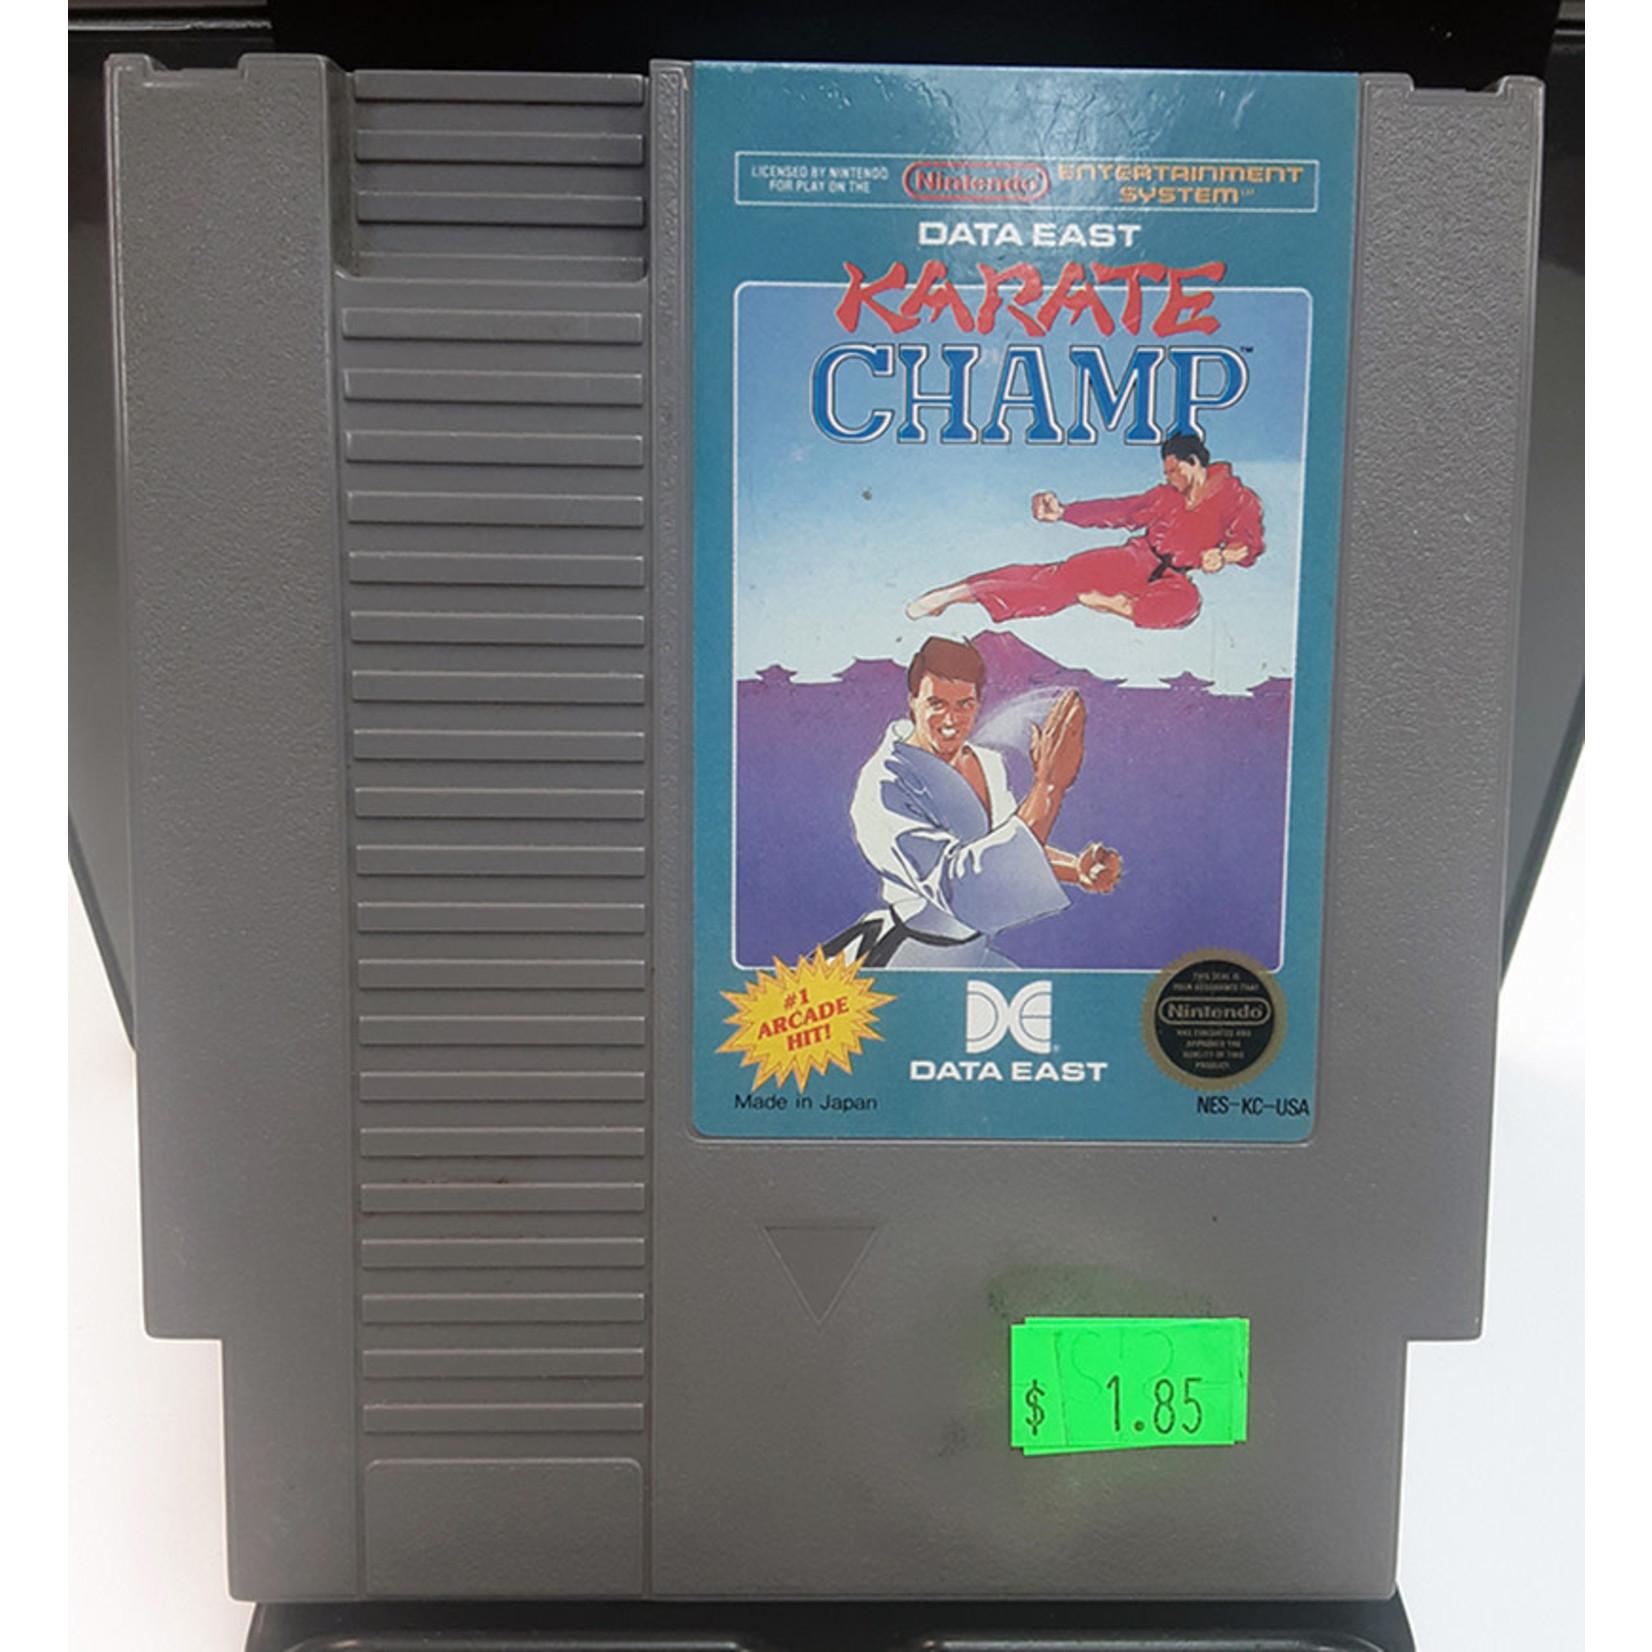 nesu-Karate Champ (cartridge)